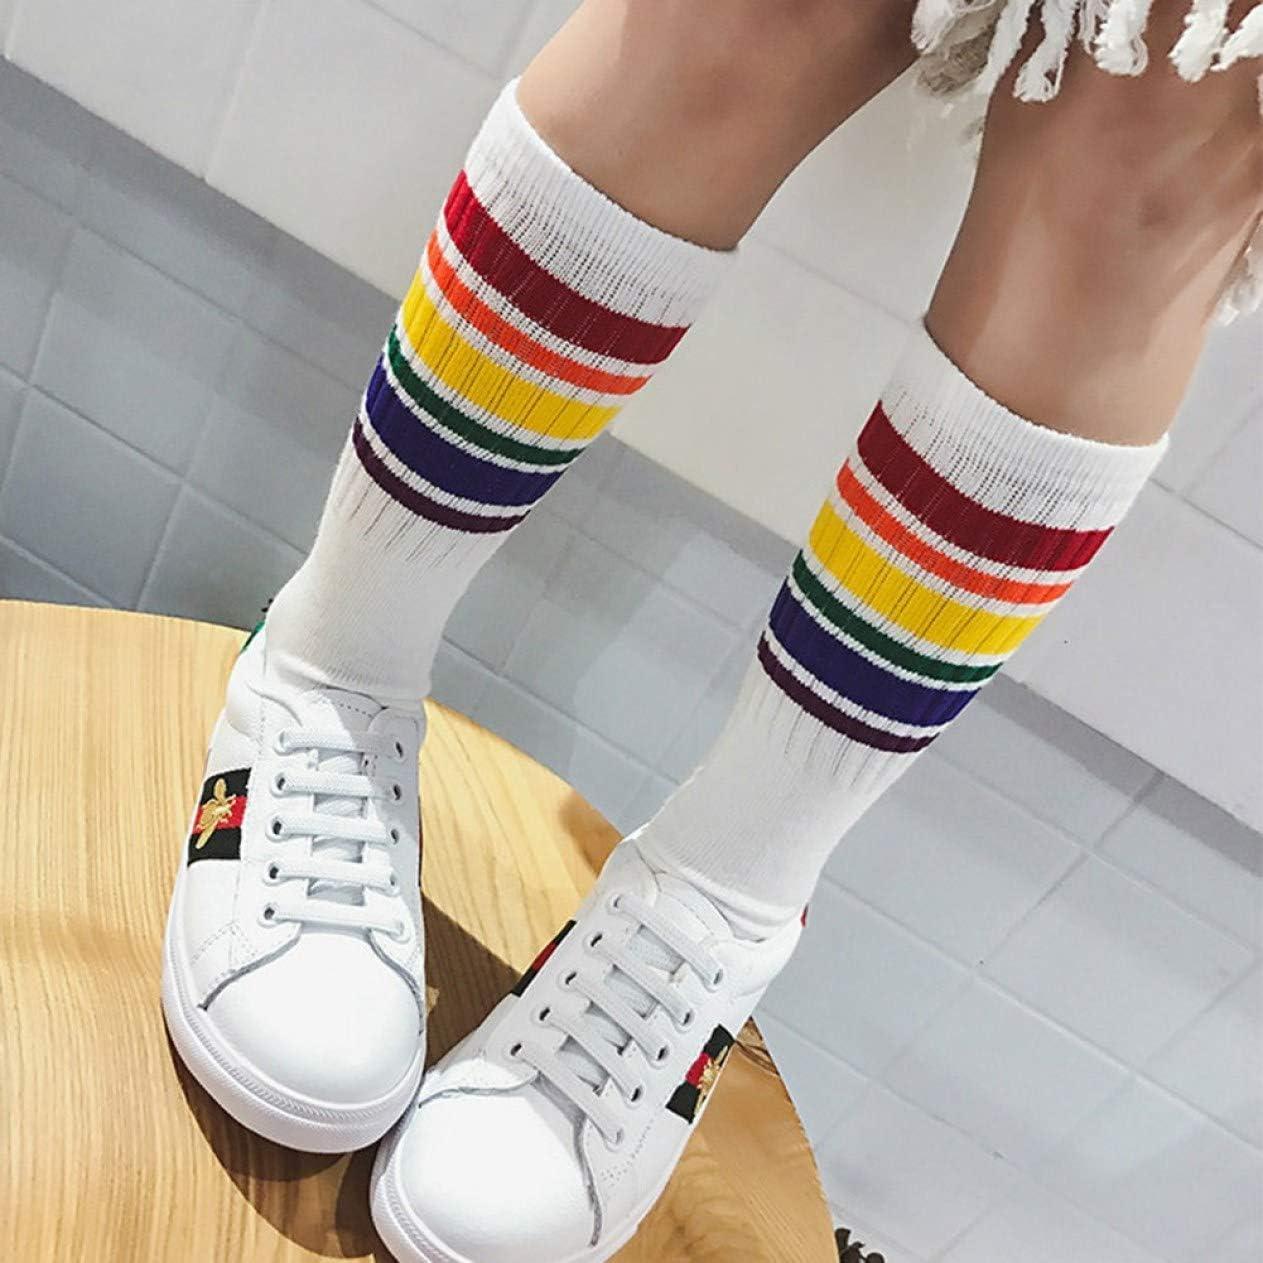 WT-L calcetines de algod/ón calcetines para ni/ños. jinwo Lindos arcoiris rayados